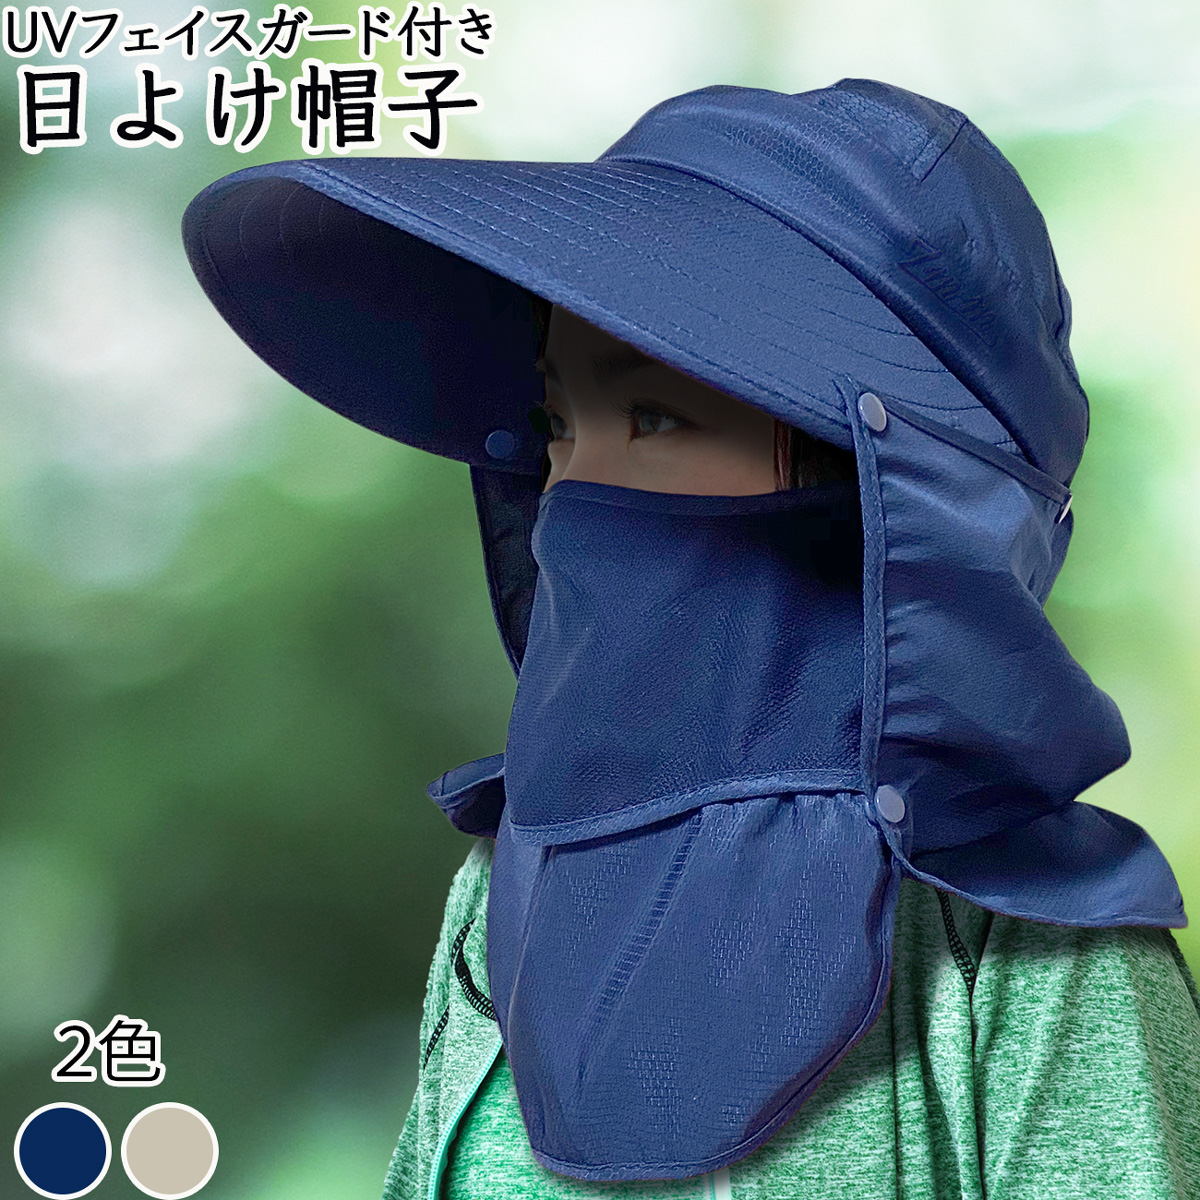 UVフェイスガード付き 日よけ帽子 UV フェイスガード付き UVフェイスカバー 完全遮光帽子 uvカット ツバ広 今だけ限定15%OFFクーポン発行中 男女兼用 取り外し可能 日よけ 山登り UVカット帽子 業界No.1 農作業 日焼け予防 紫外線対策